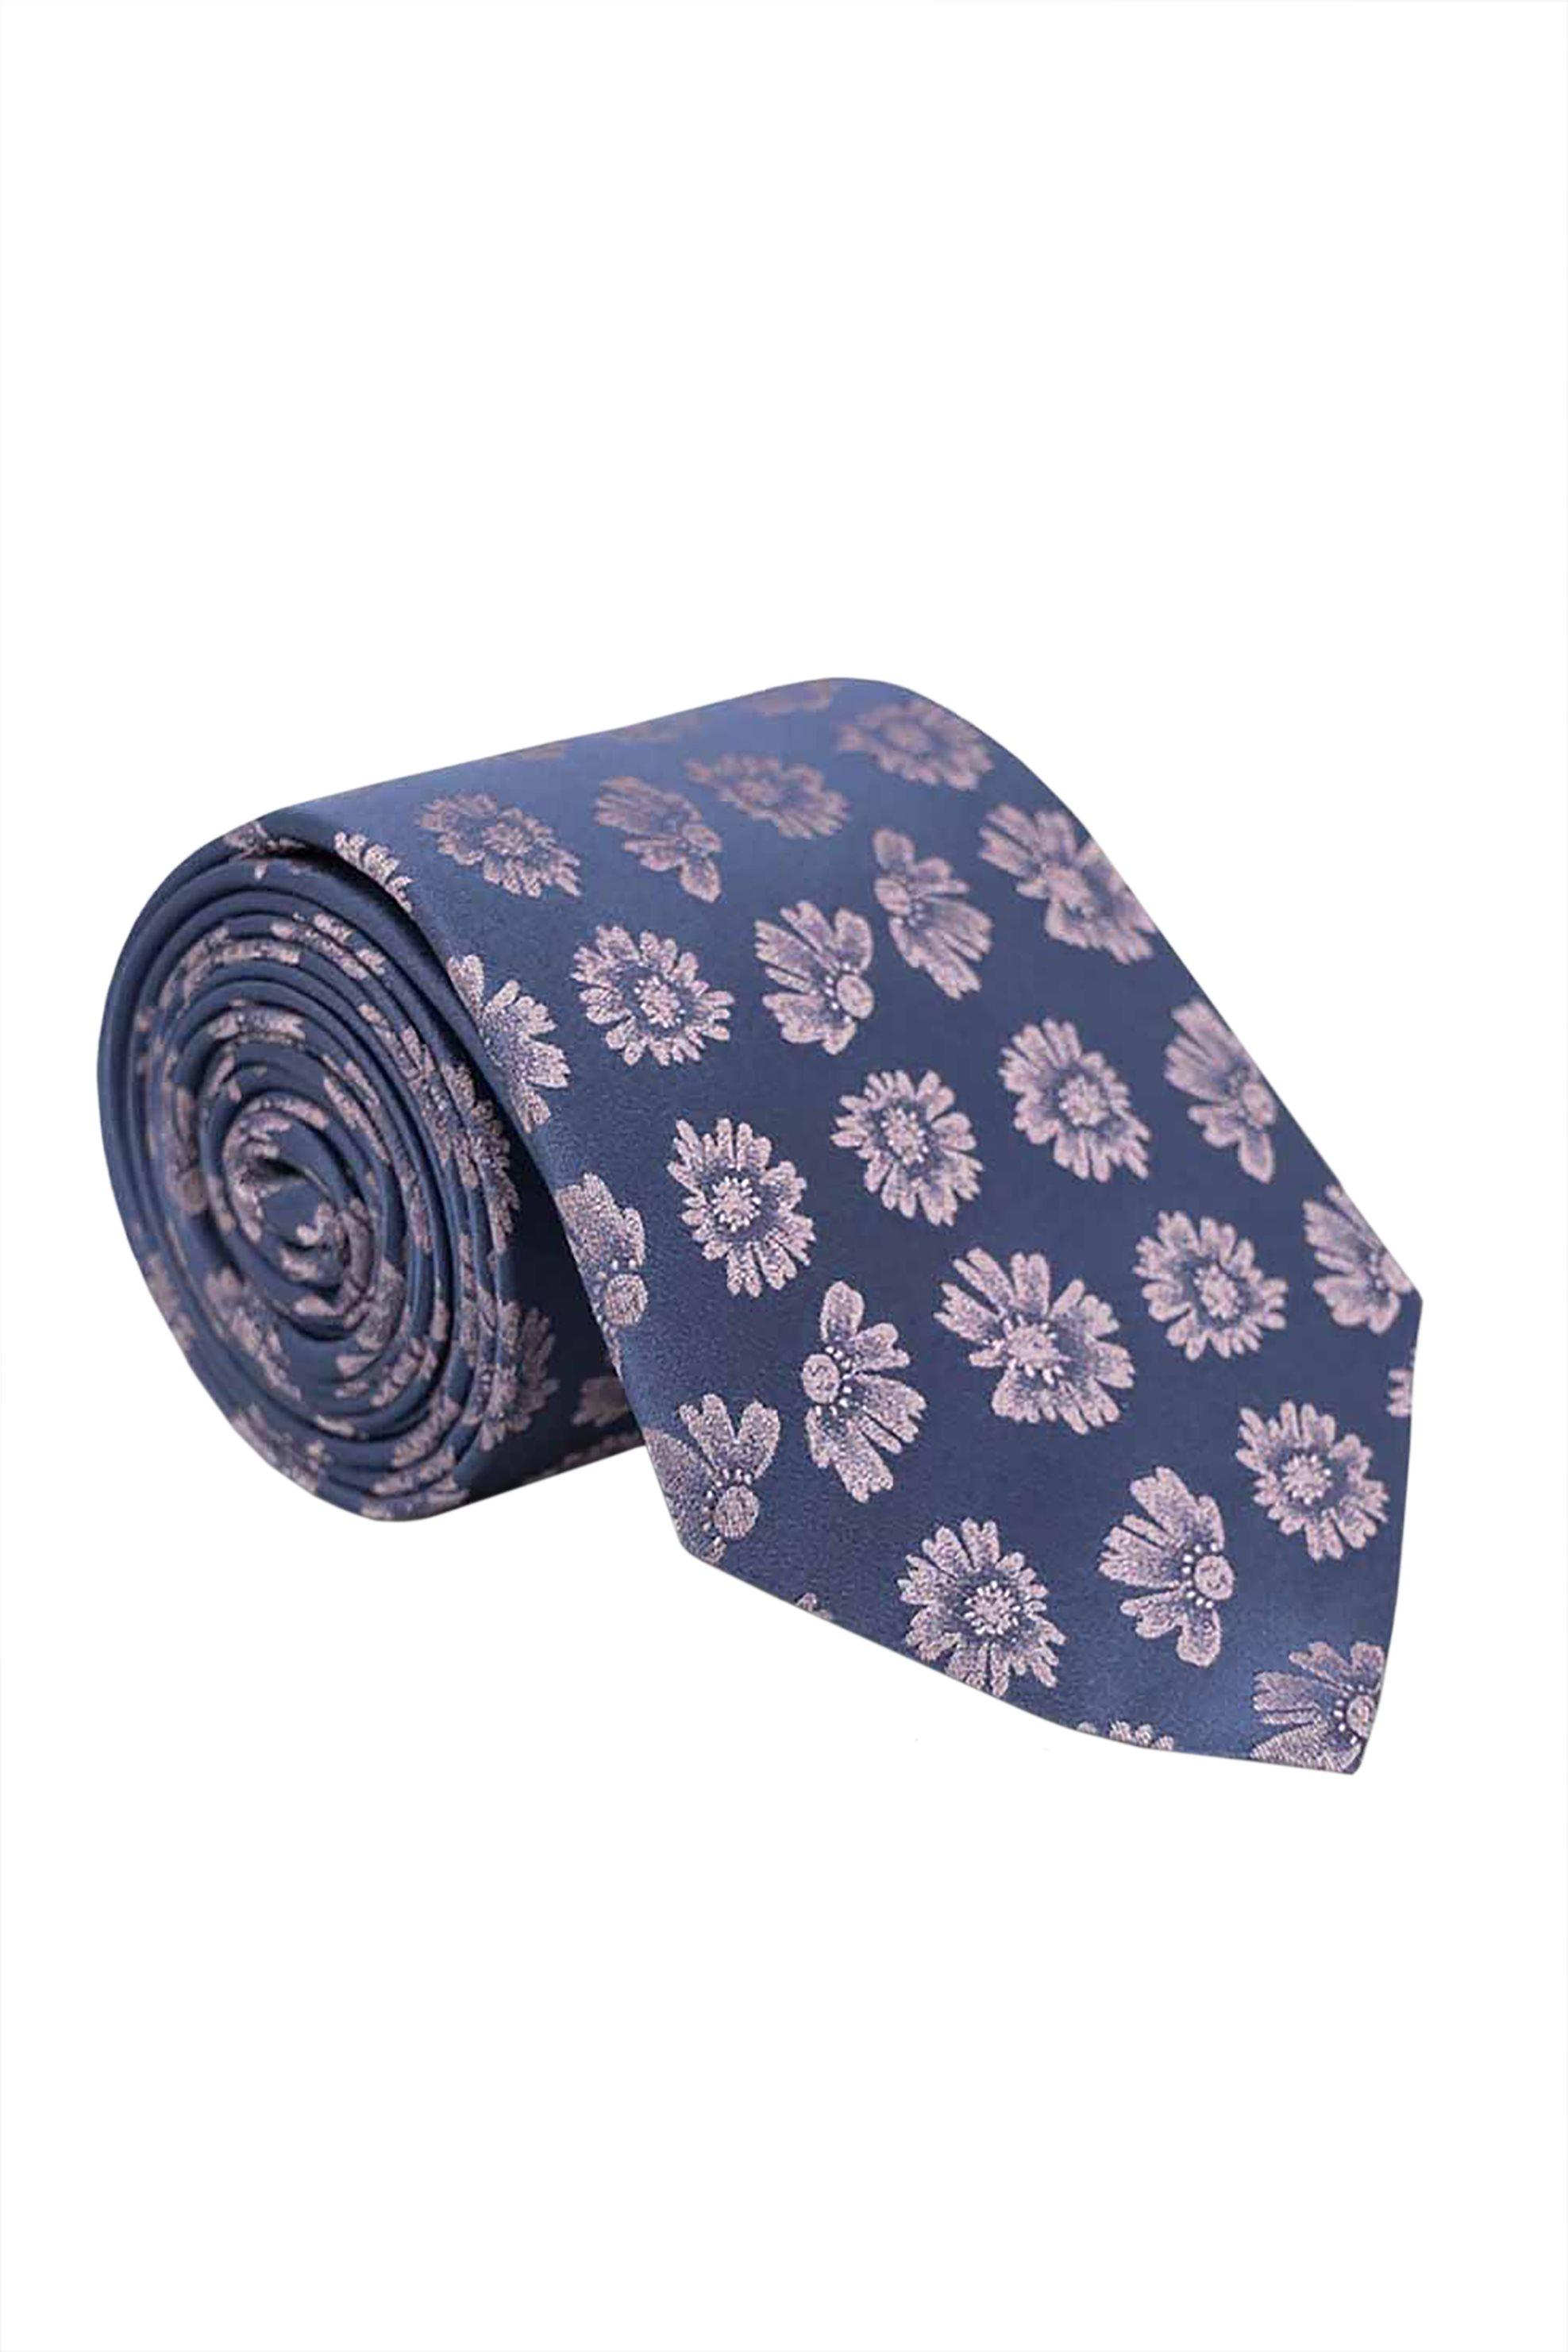 Oxford Company ανδρική μεταξωτή γραβάτα με floral print - TIE51-413.03 - Μπλε